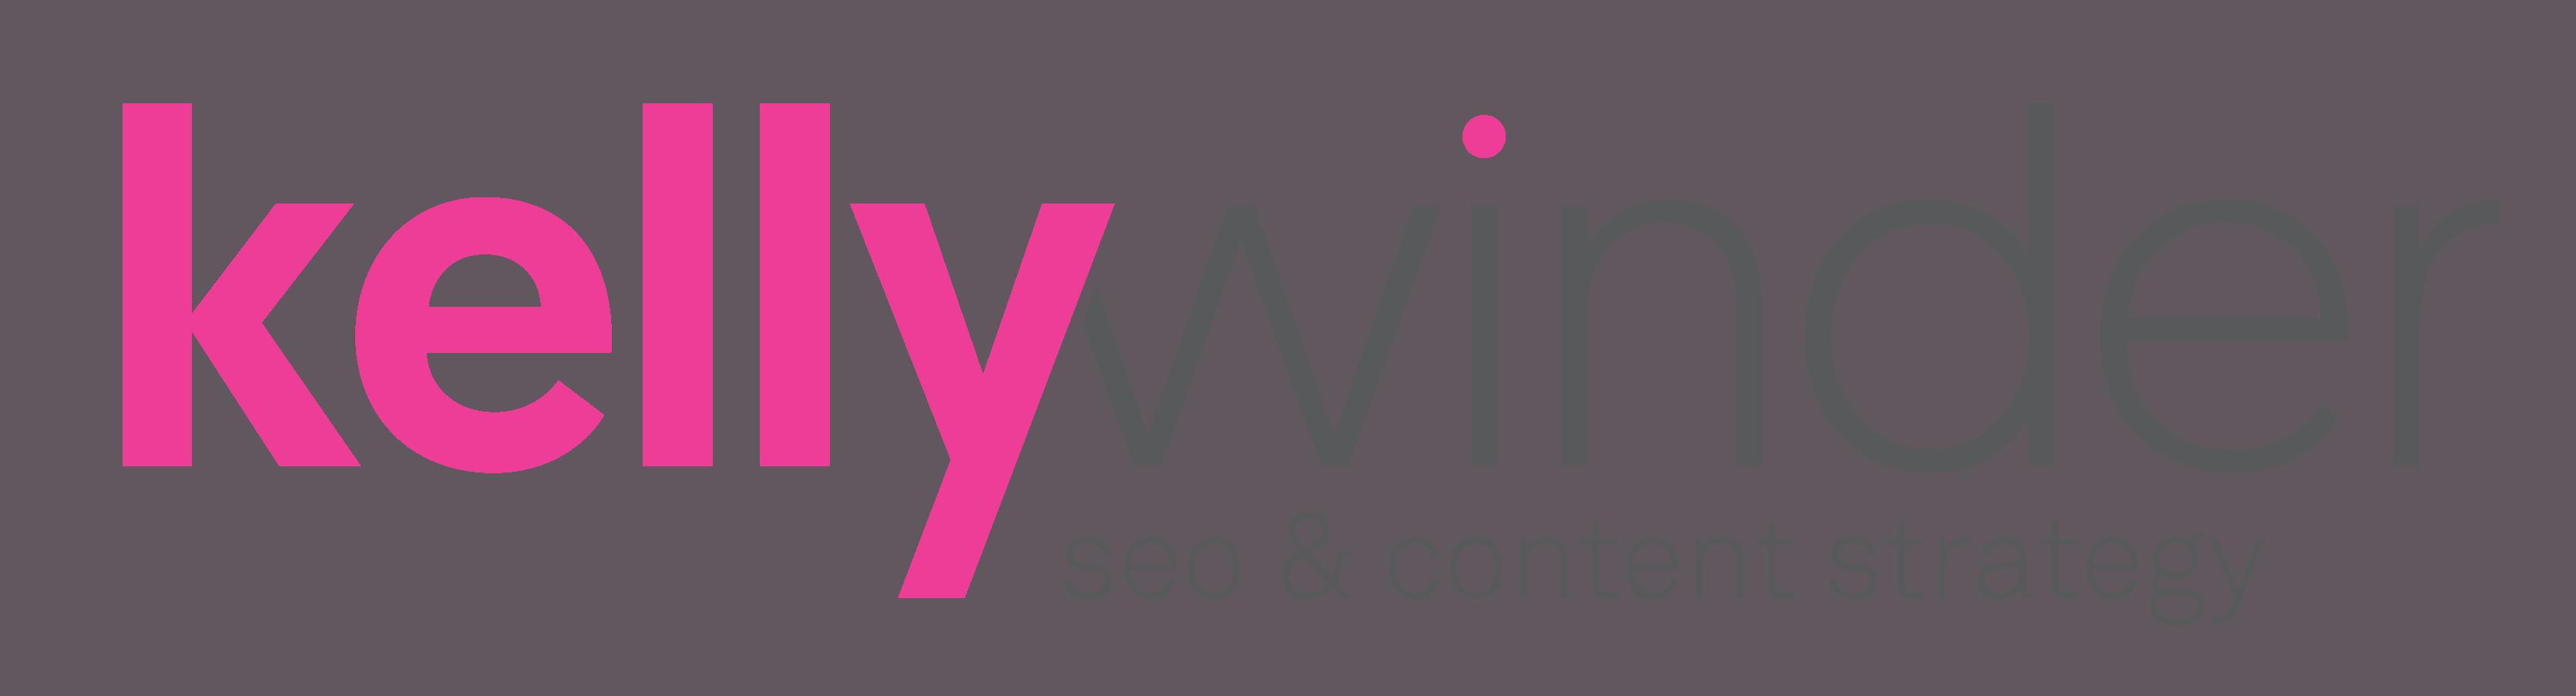 Kelly Winder logo